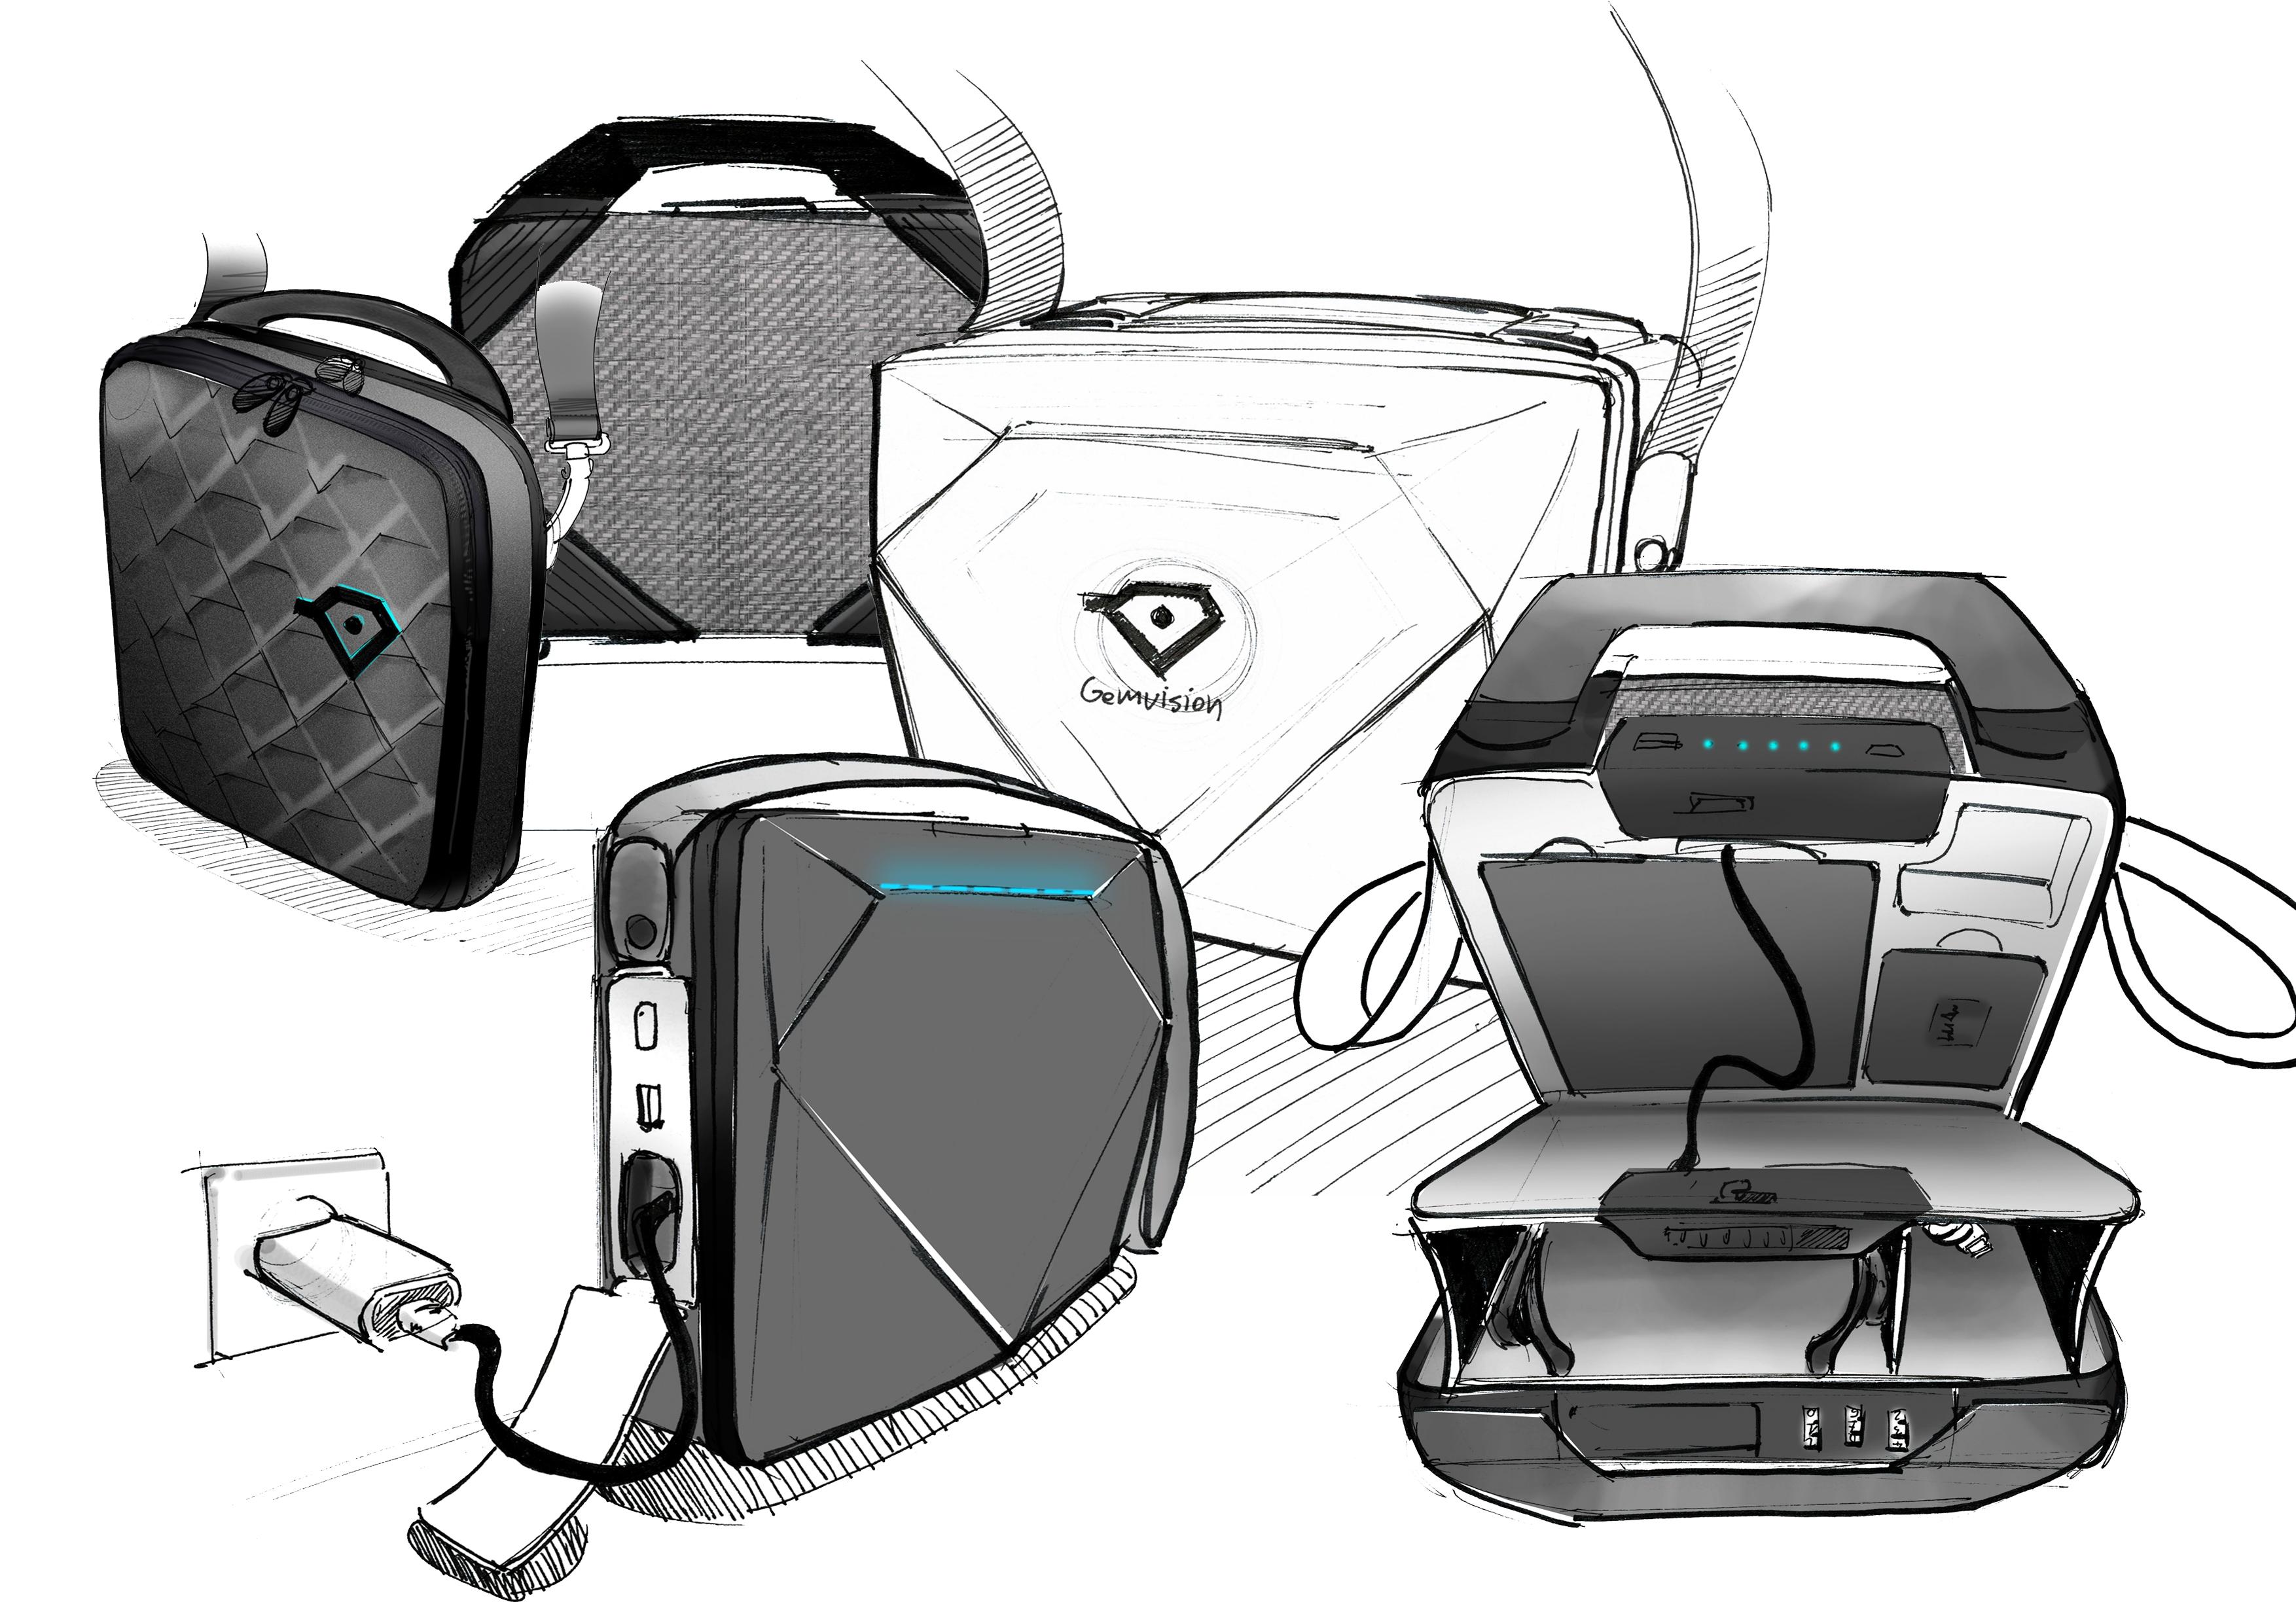 Gemvision Vuzix carry case design sketches